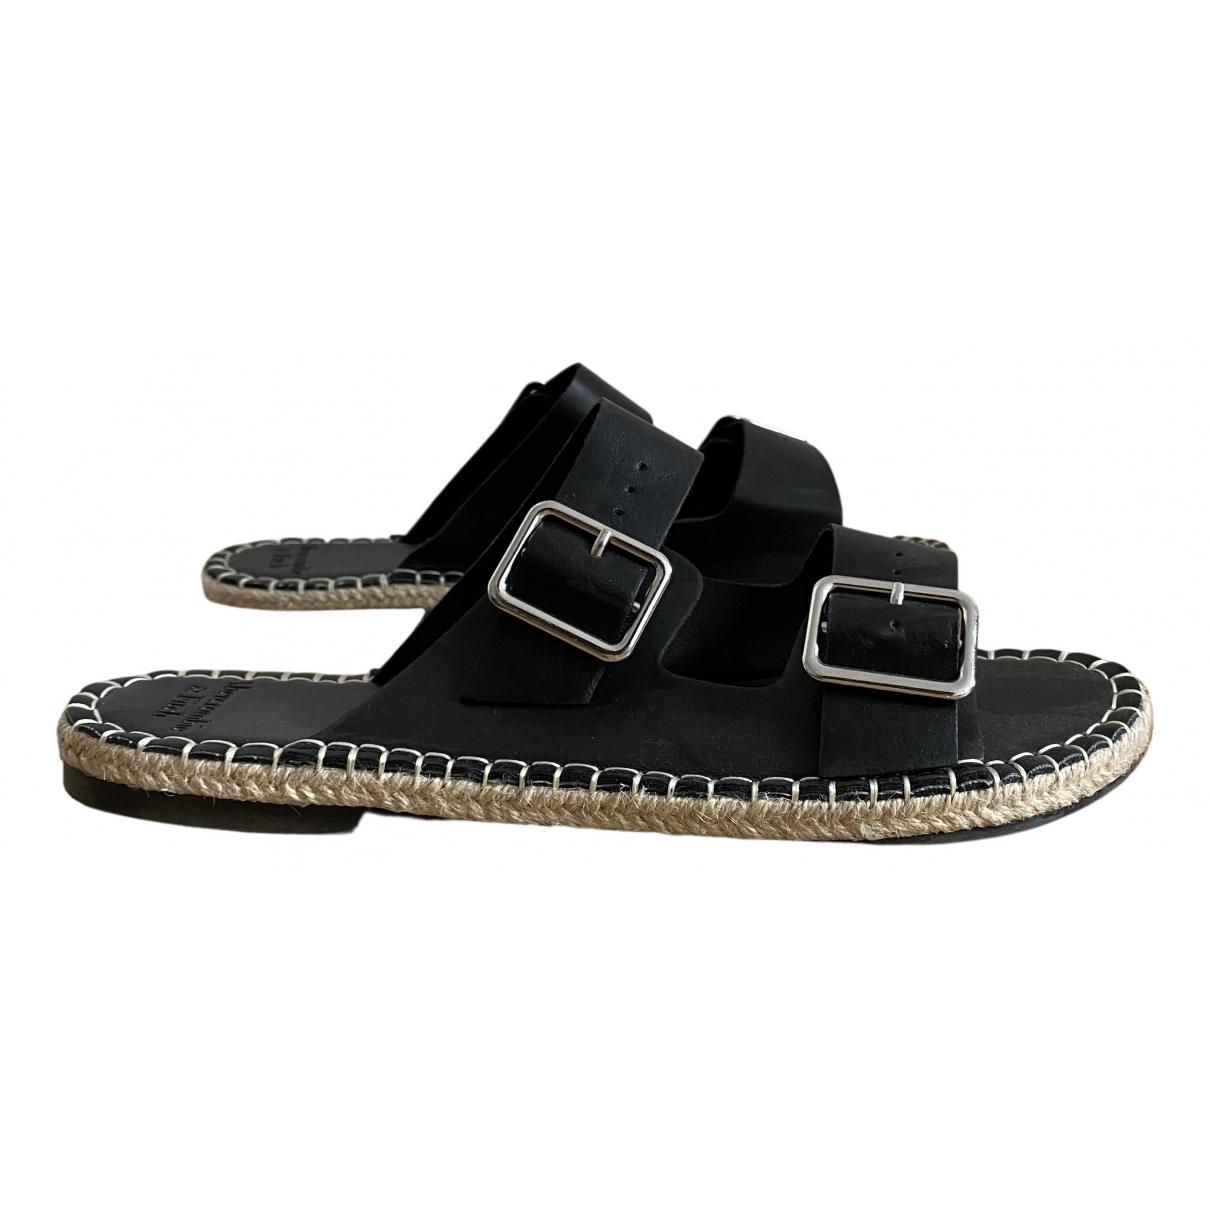 Abercrombie & Fitch \N Sandalen in  Schwarz Lackleder